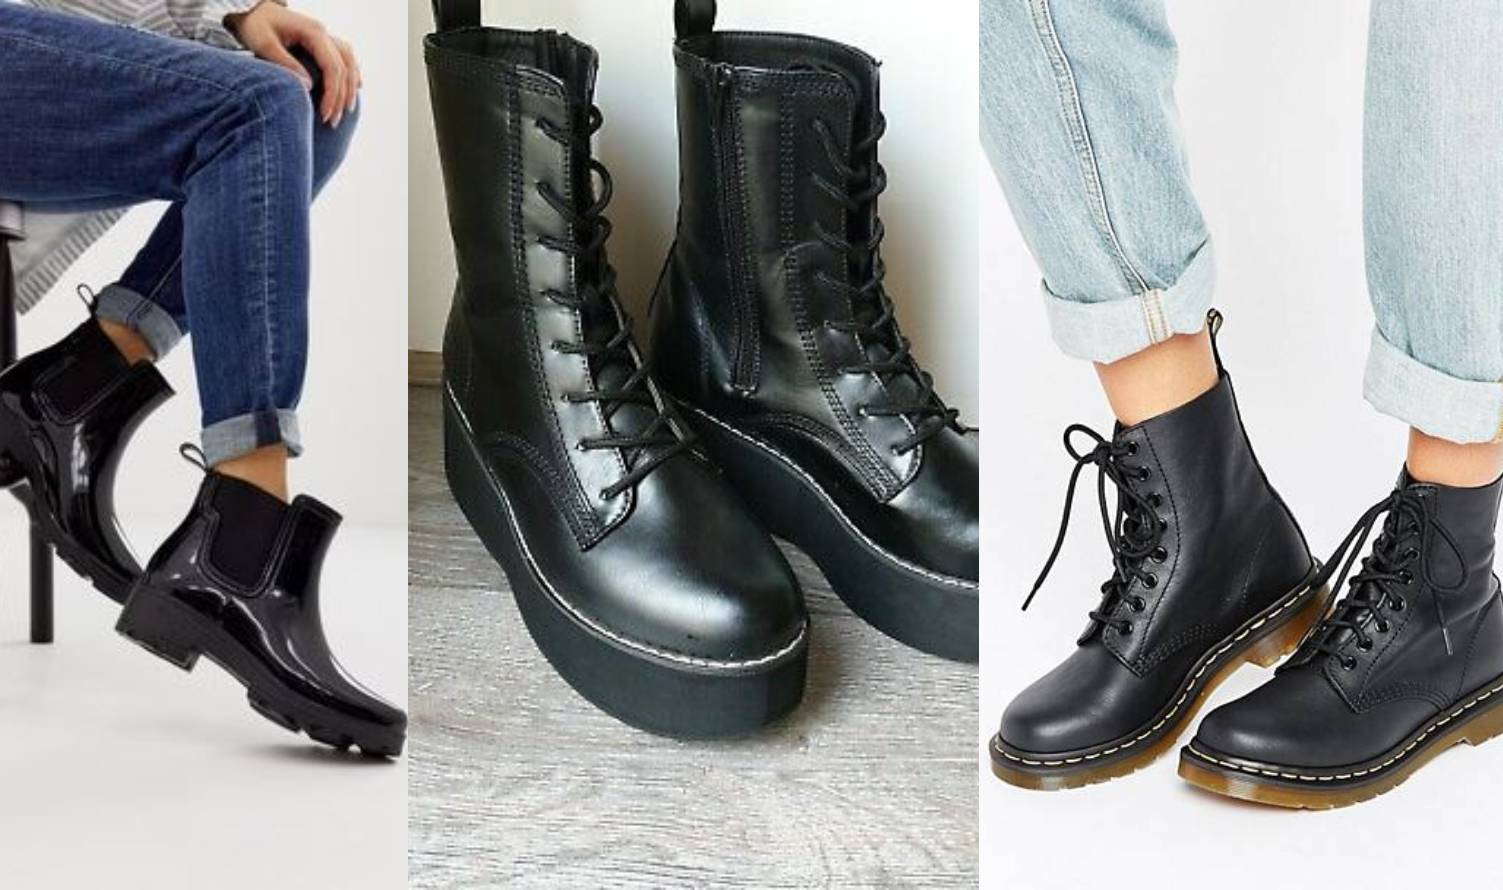 Stilski favorit 2020.: Poluvisoke crne čizme glomaznog dizajna